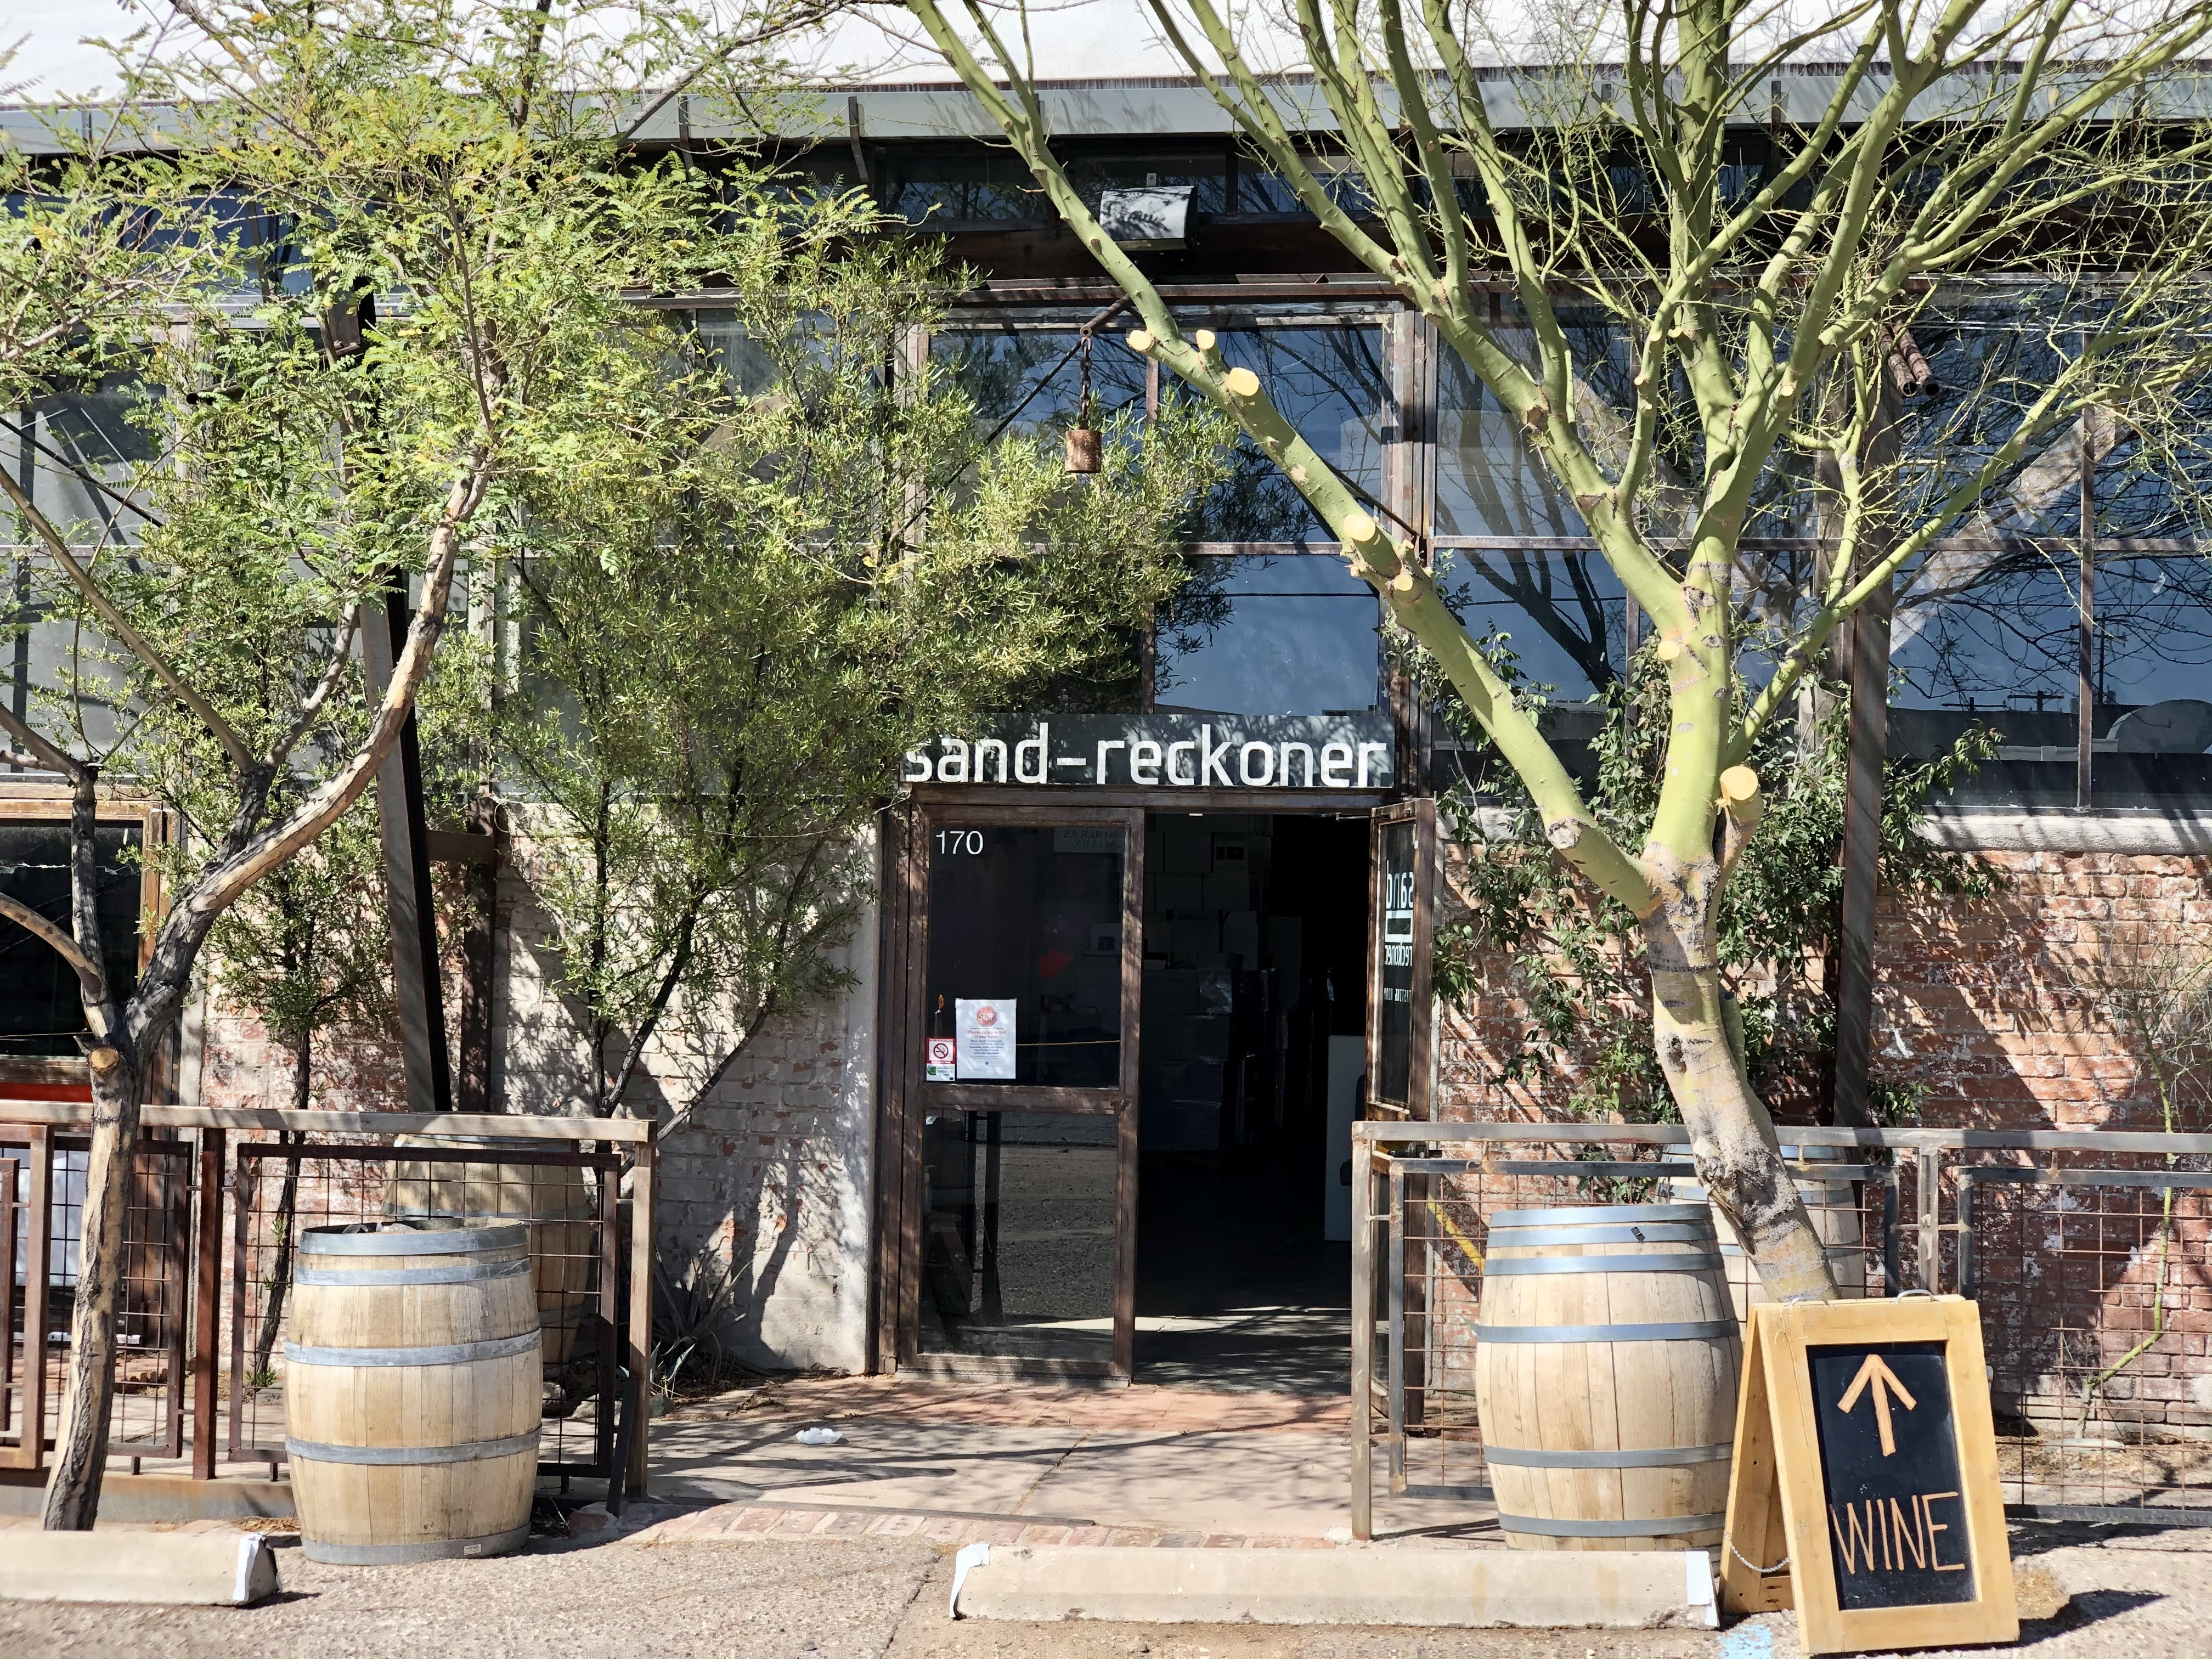 Tucson tasting room Sand-Reckoner